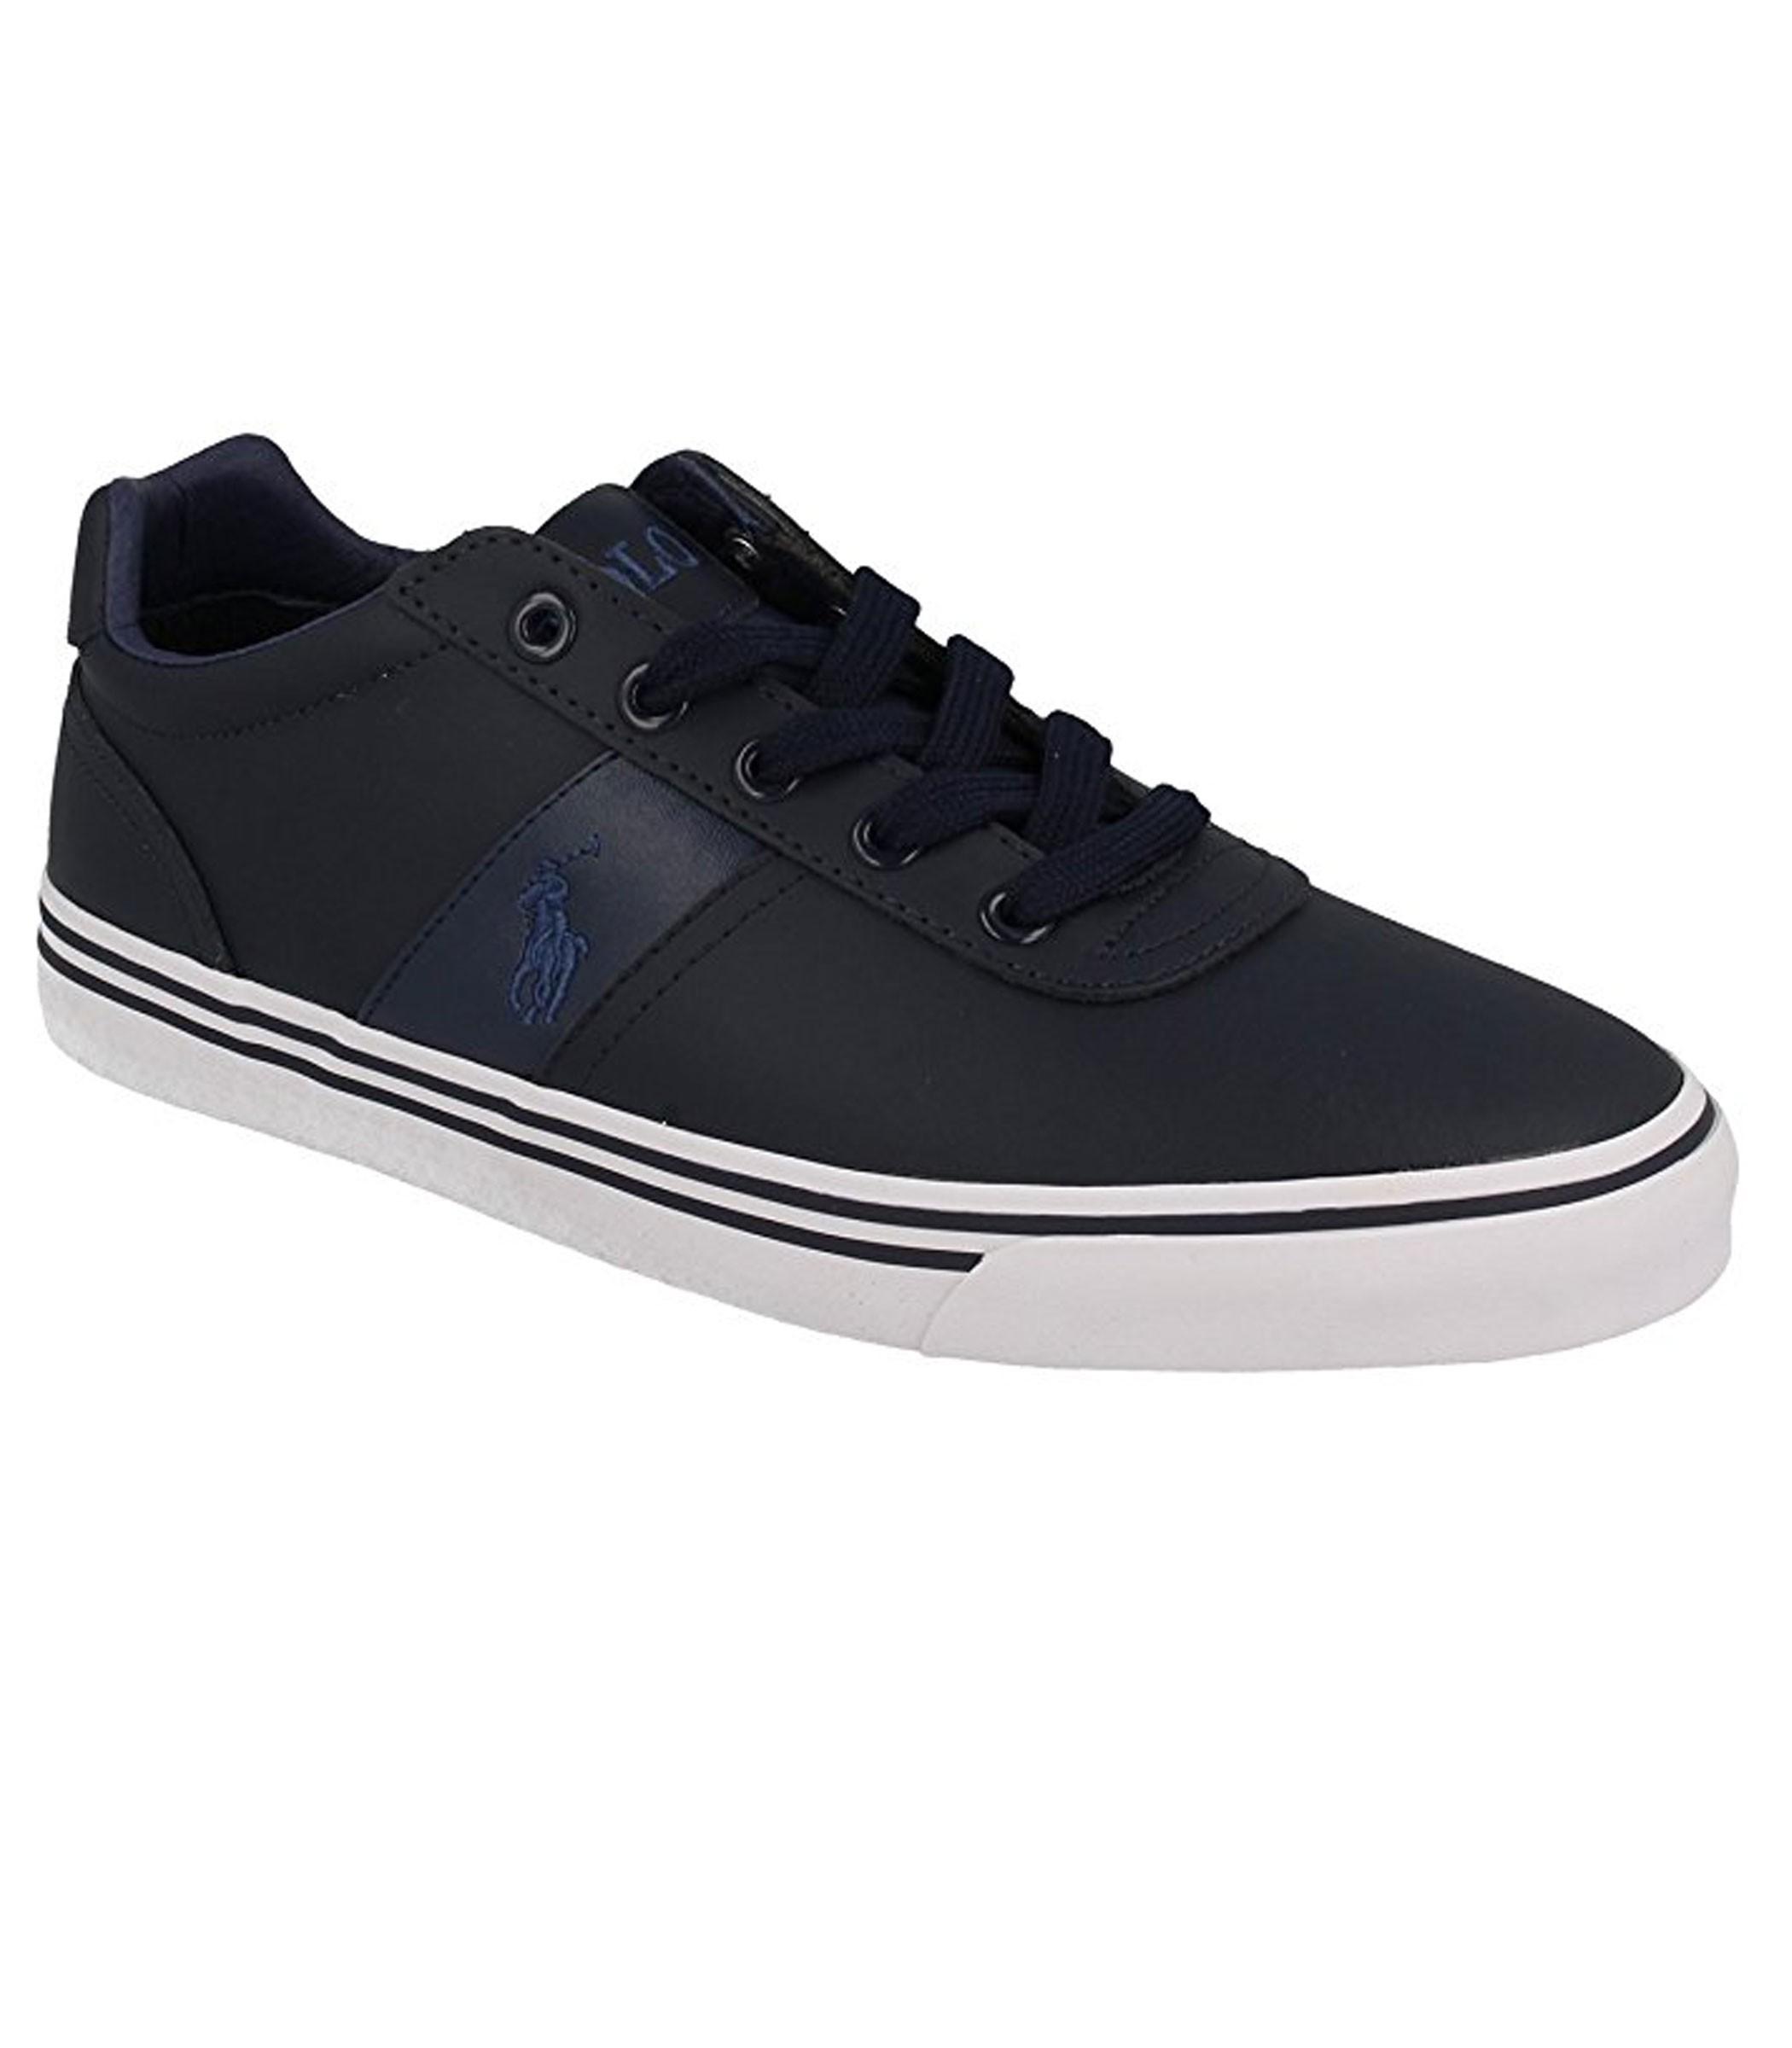 Scarpe Polo Ralph Lauren modello Hanford Blu sneakers basse ... 9f597c055a0